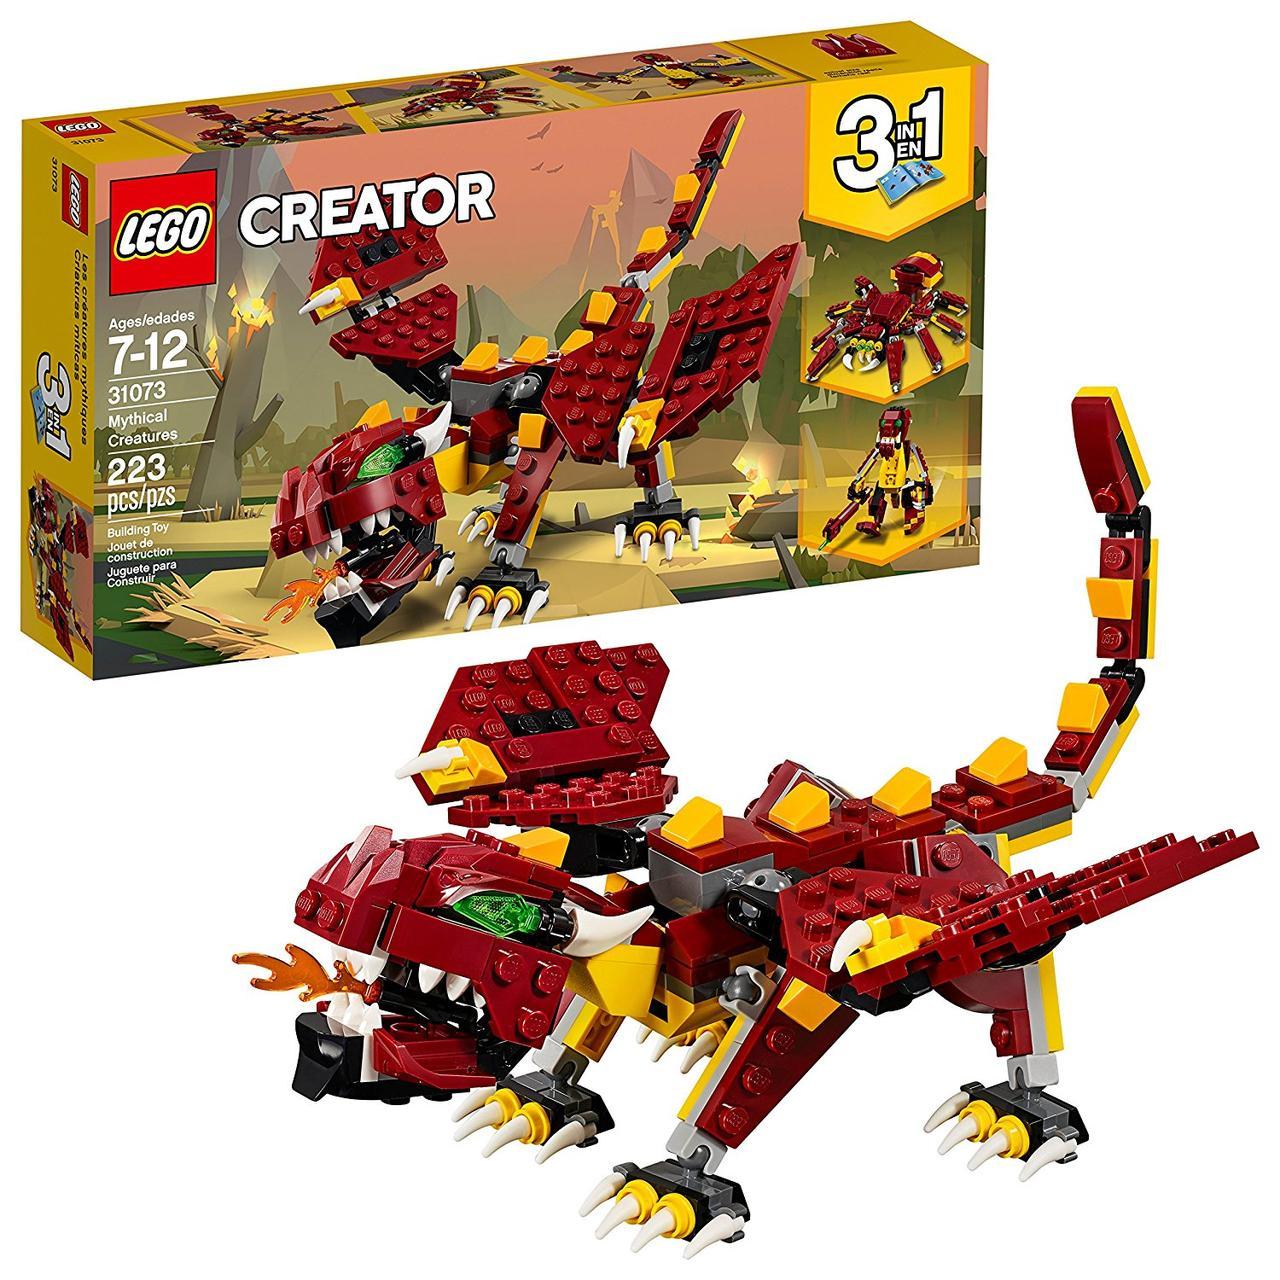 Конструктор LEGO Creator Міфічні істоти 223 деталі